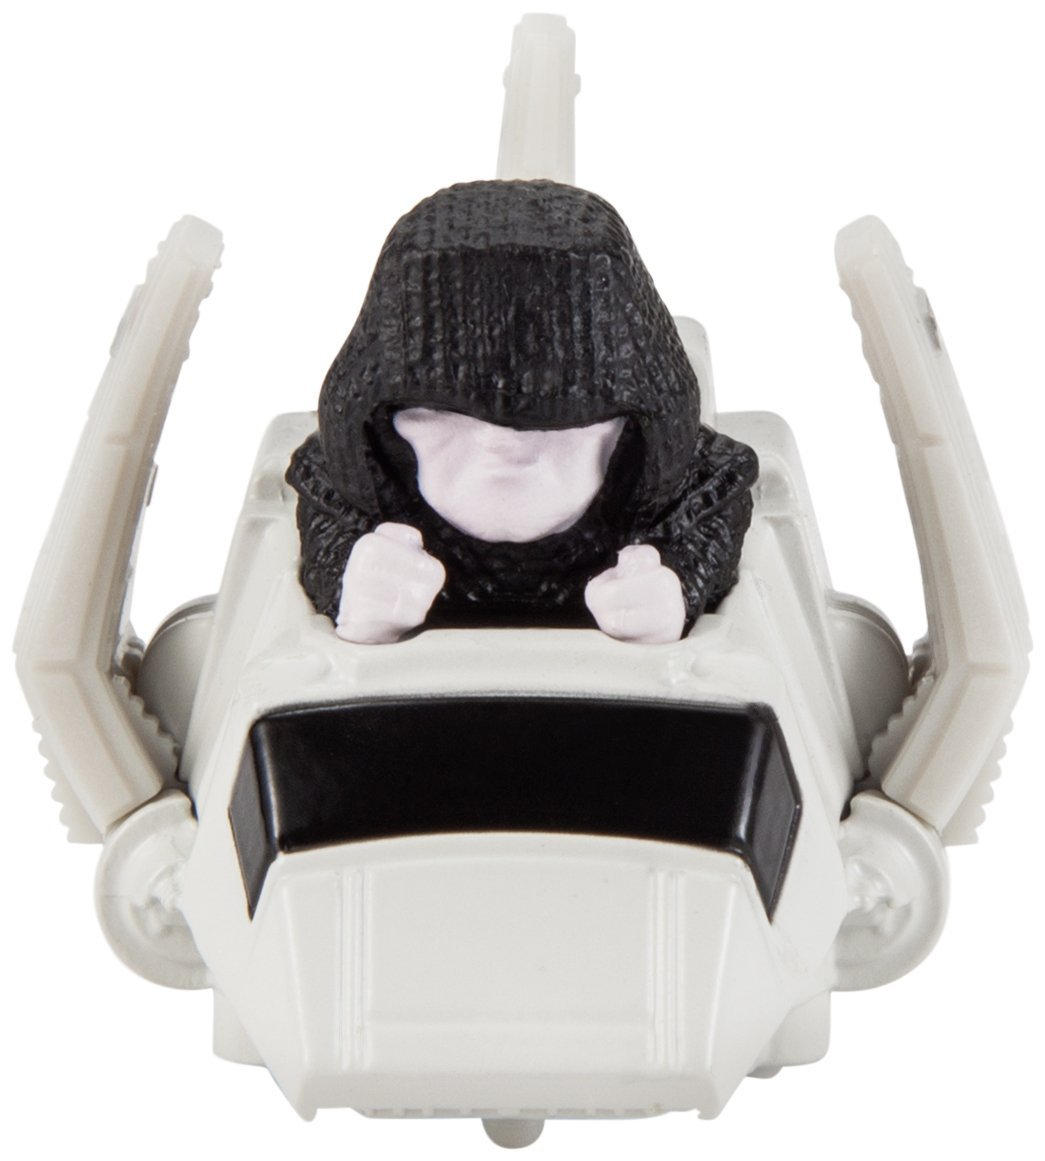 TLJ HW Emperor Palpatine Imperial Shuttle Battle Roller Vehicle Toy 2